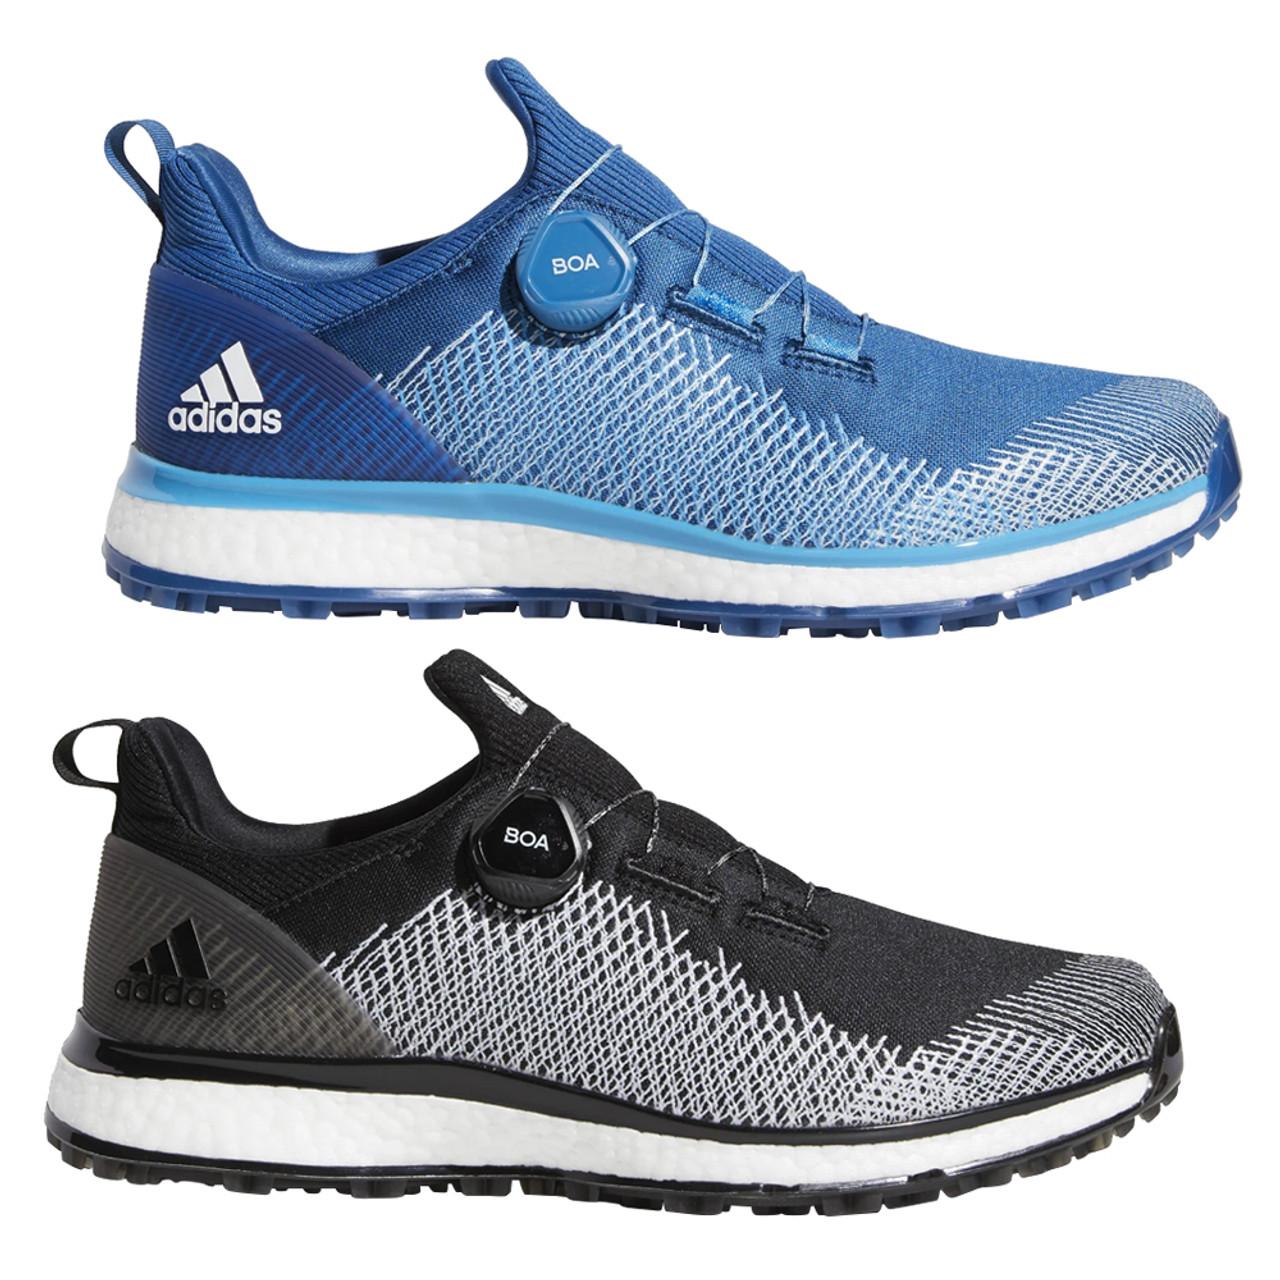 Adidas Forgefiber BOA Spikeless Golf